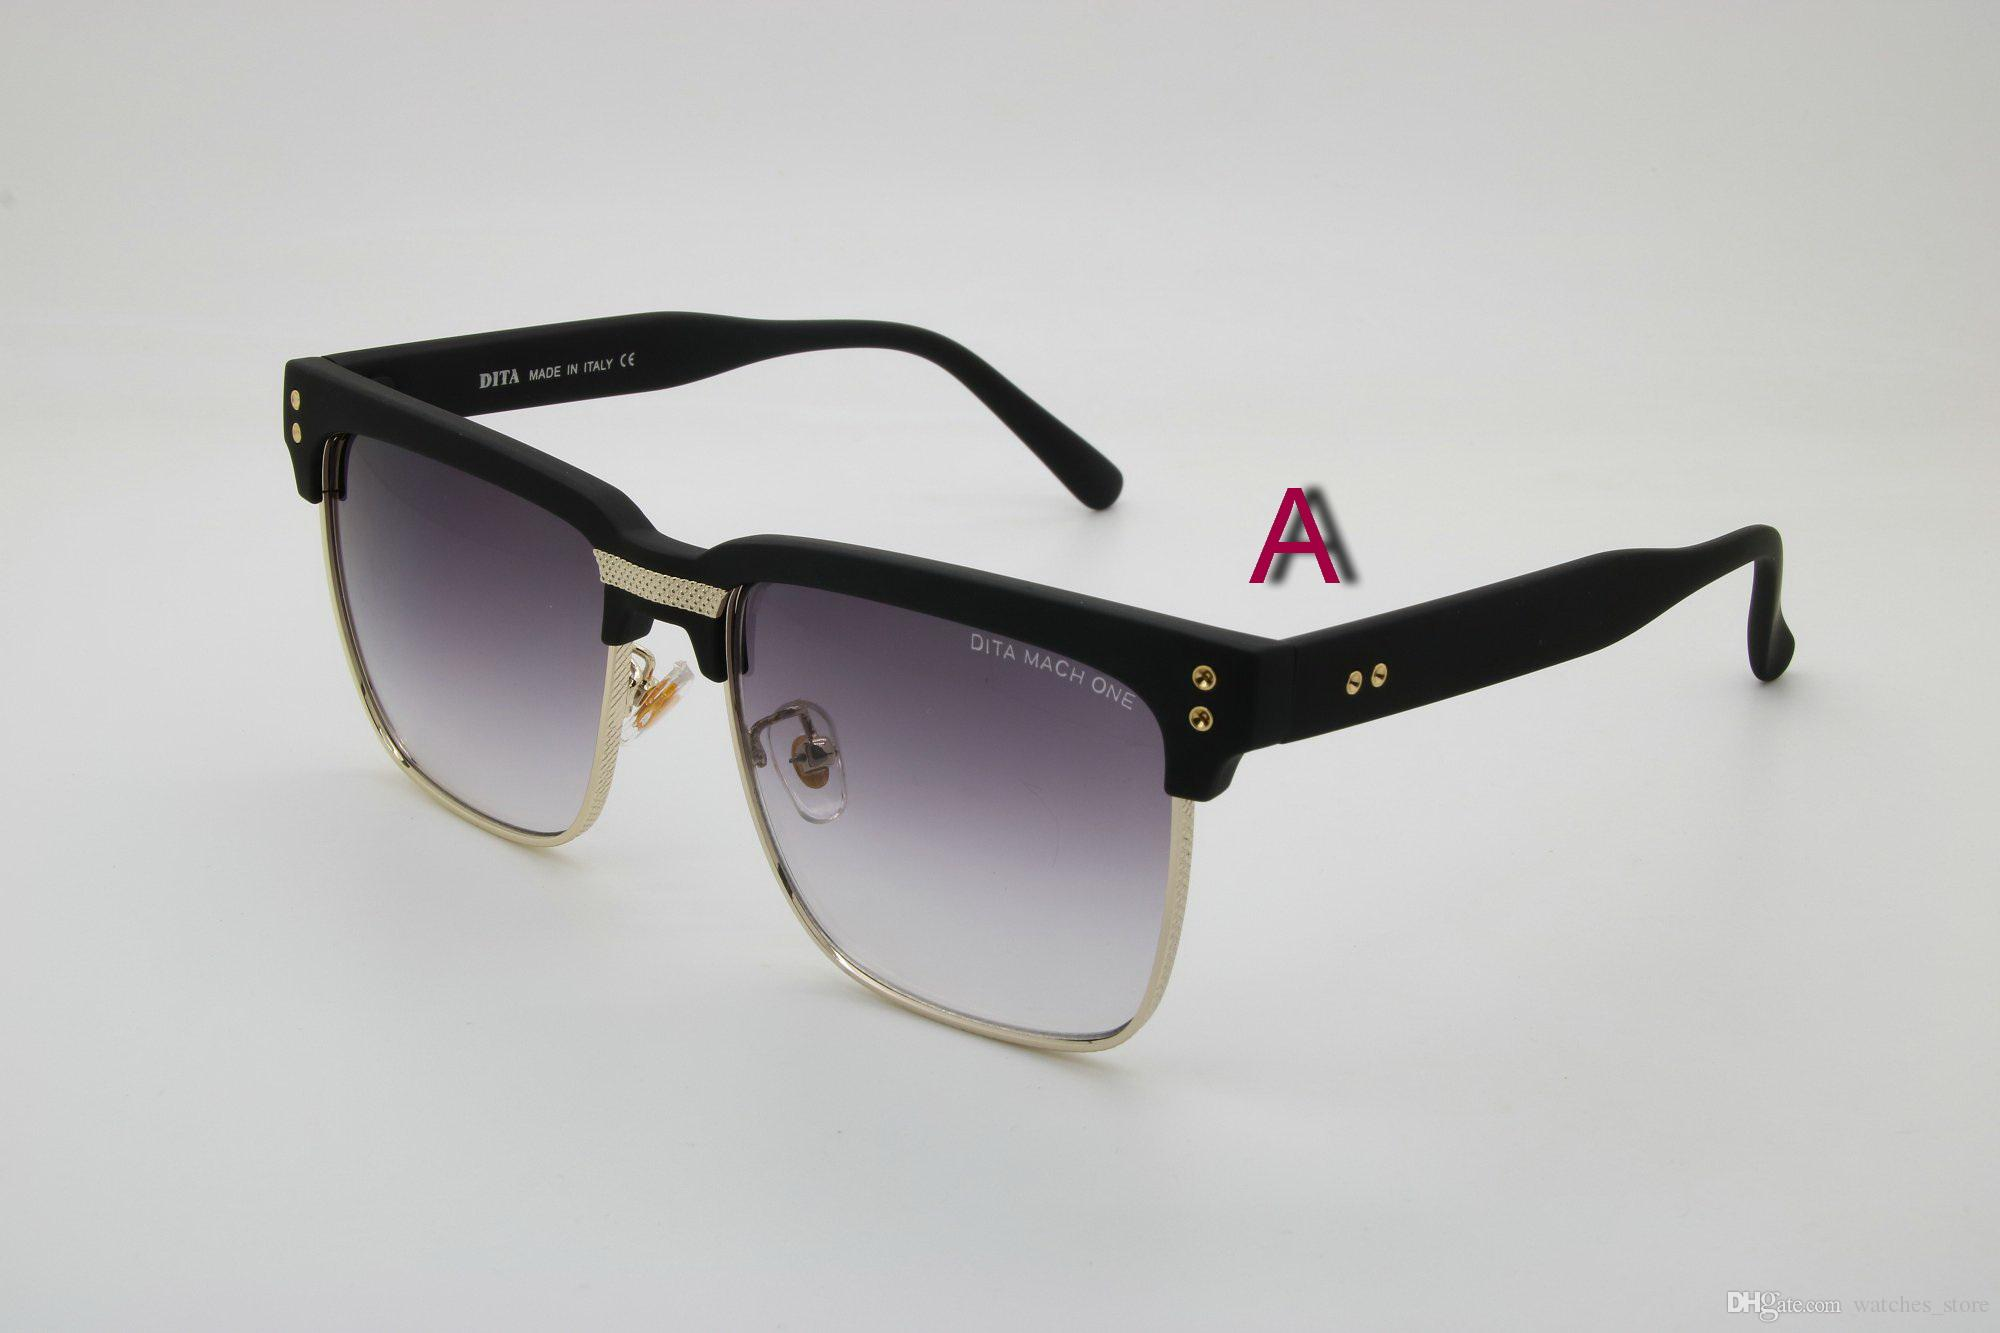 c21ae348447 Dita Sunglasses Men 6157 New Unisex Dita MACH ONE Sunglasses Women Brand  Designer Sun Glasses Men Vintage Sunglass Custom Sunglasses Heart Shaped  Sunglasses ...